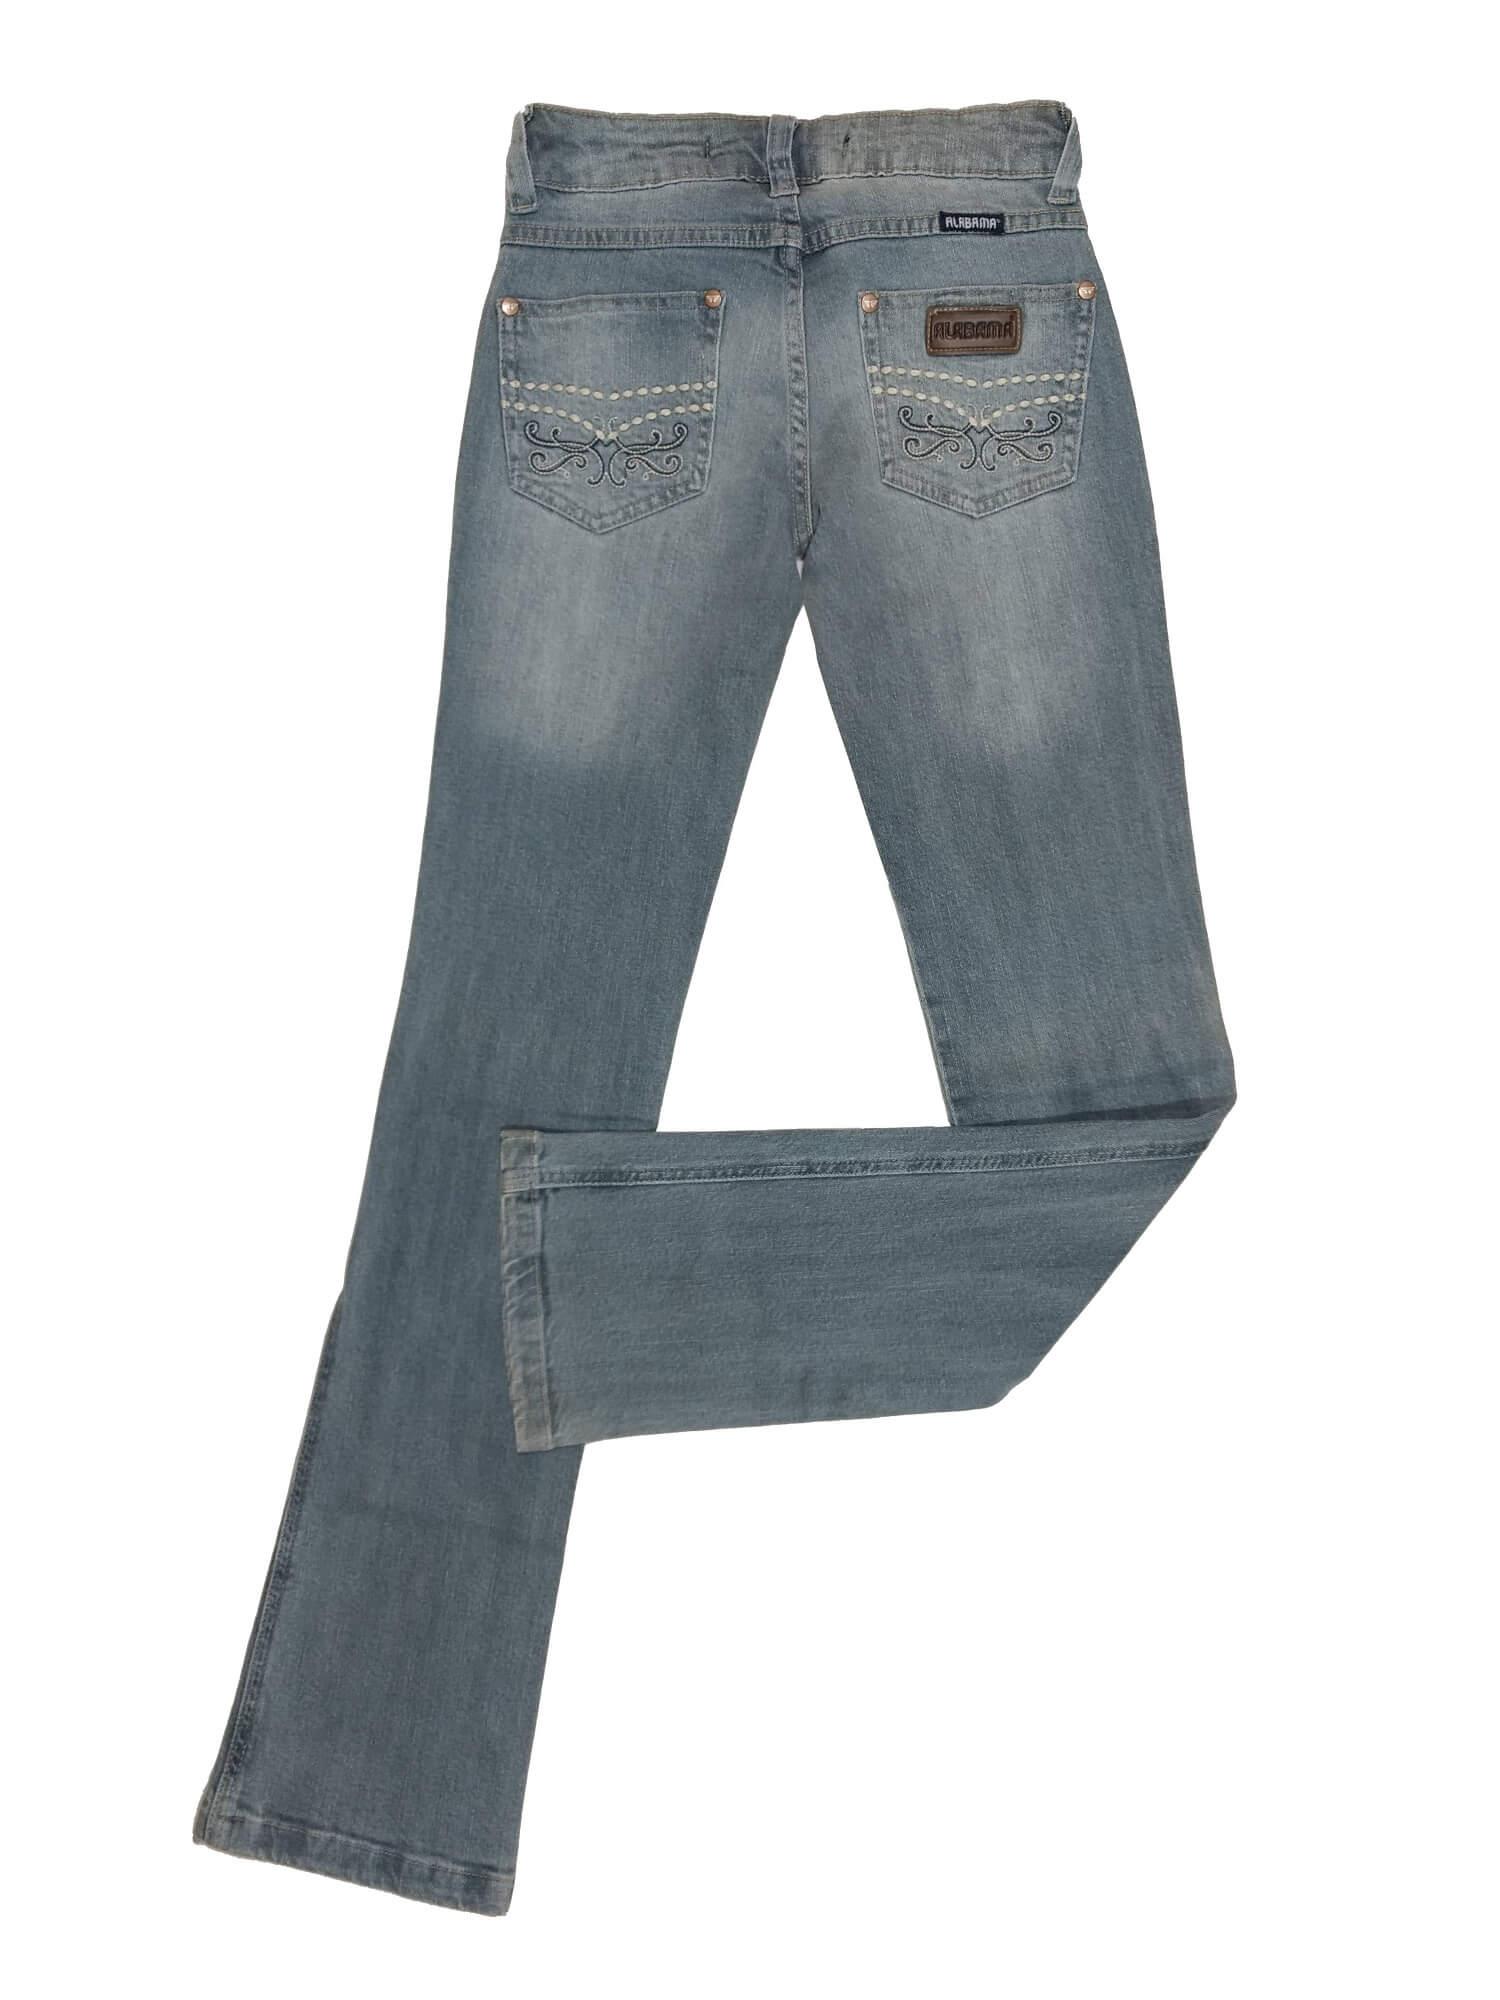 Calça Feminina Alabama Stretch Ref. 802.077-479